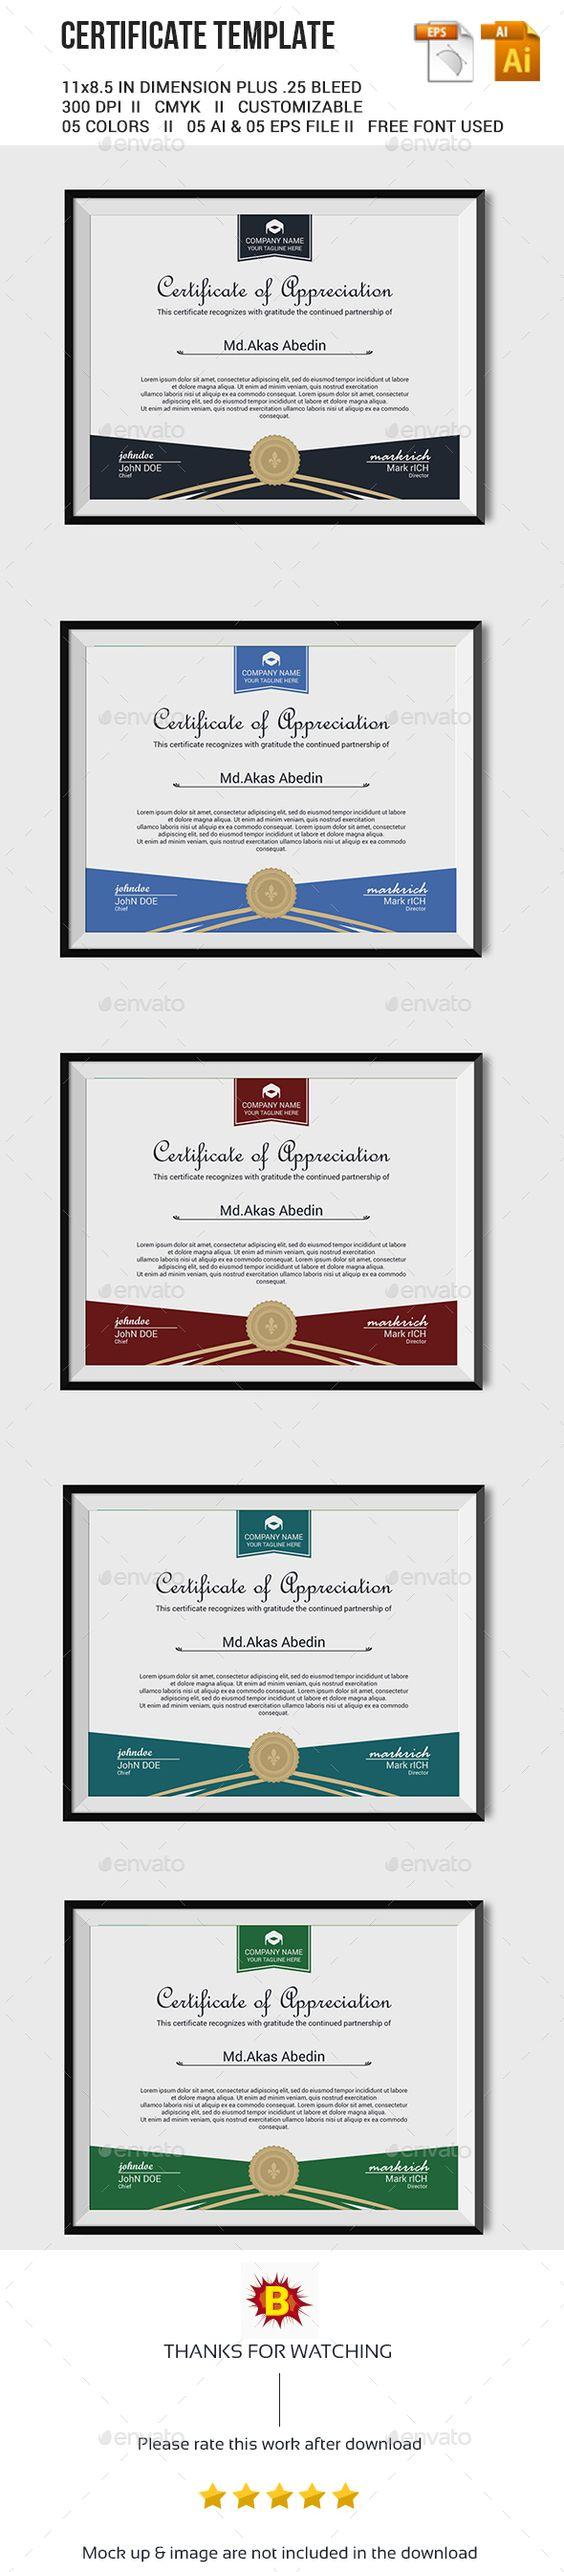 Certificate template certificate pinterest certificate certificate template yadclub Choice Image